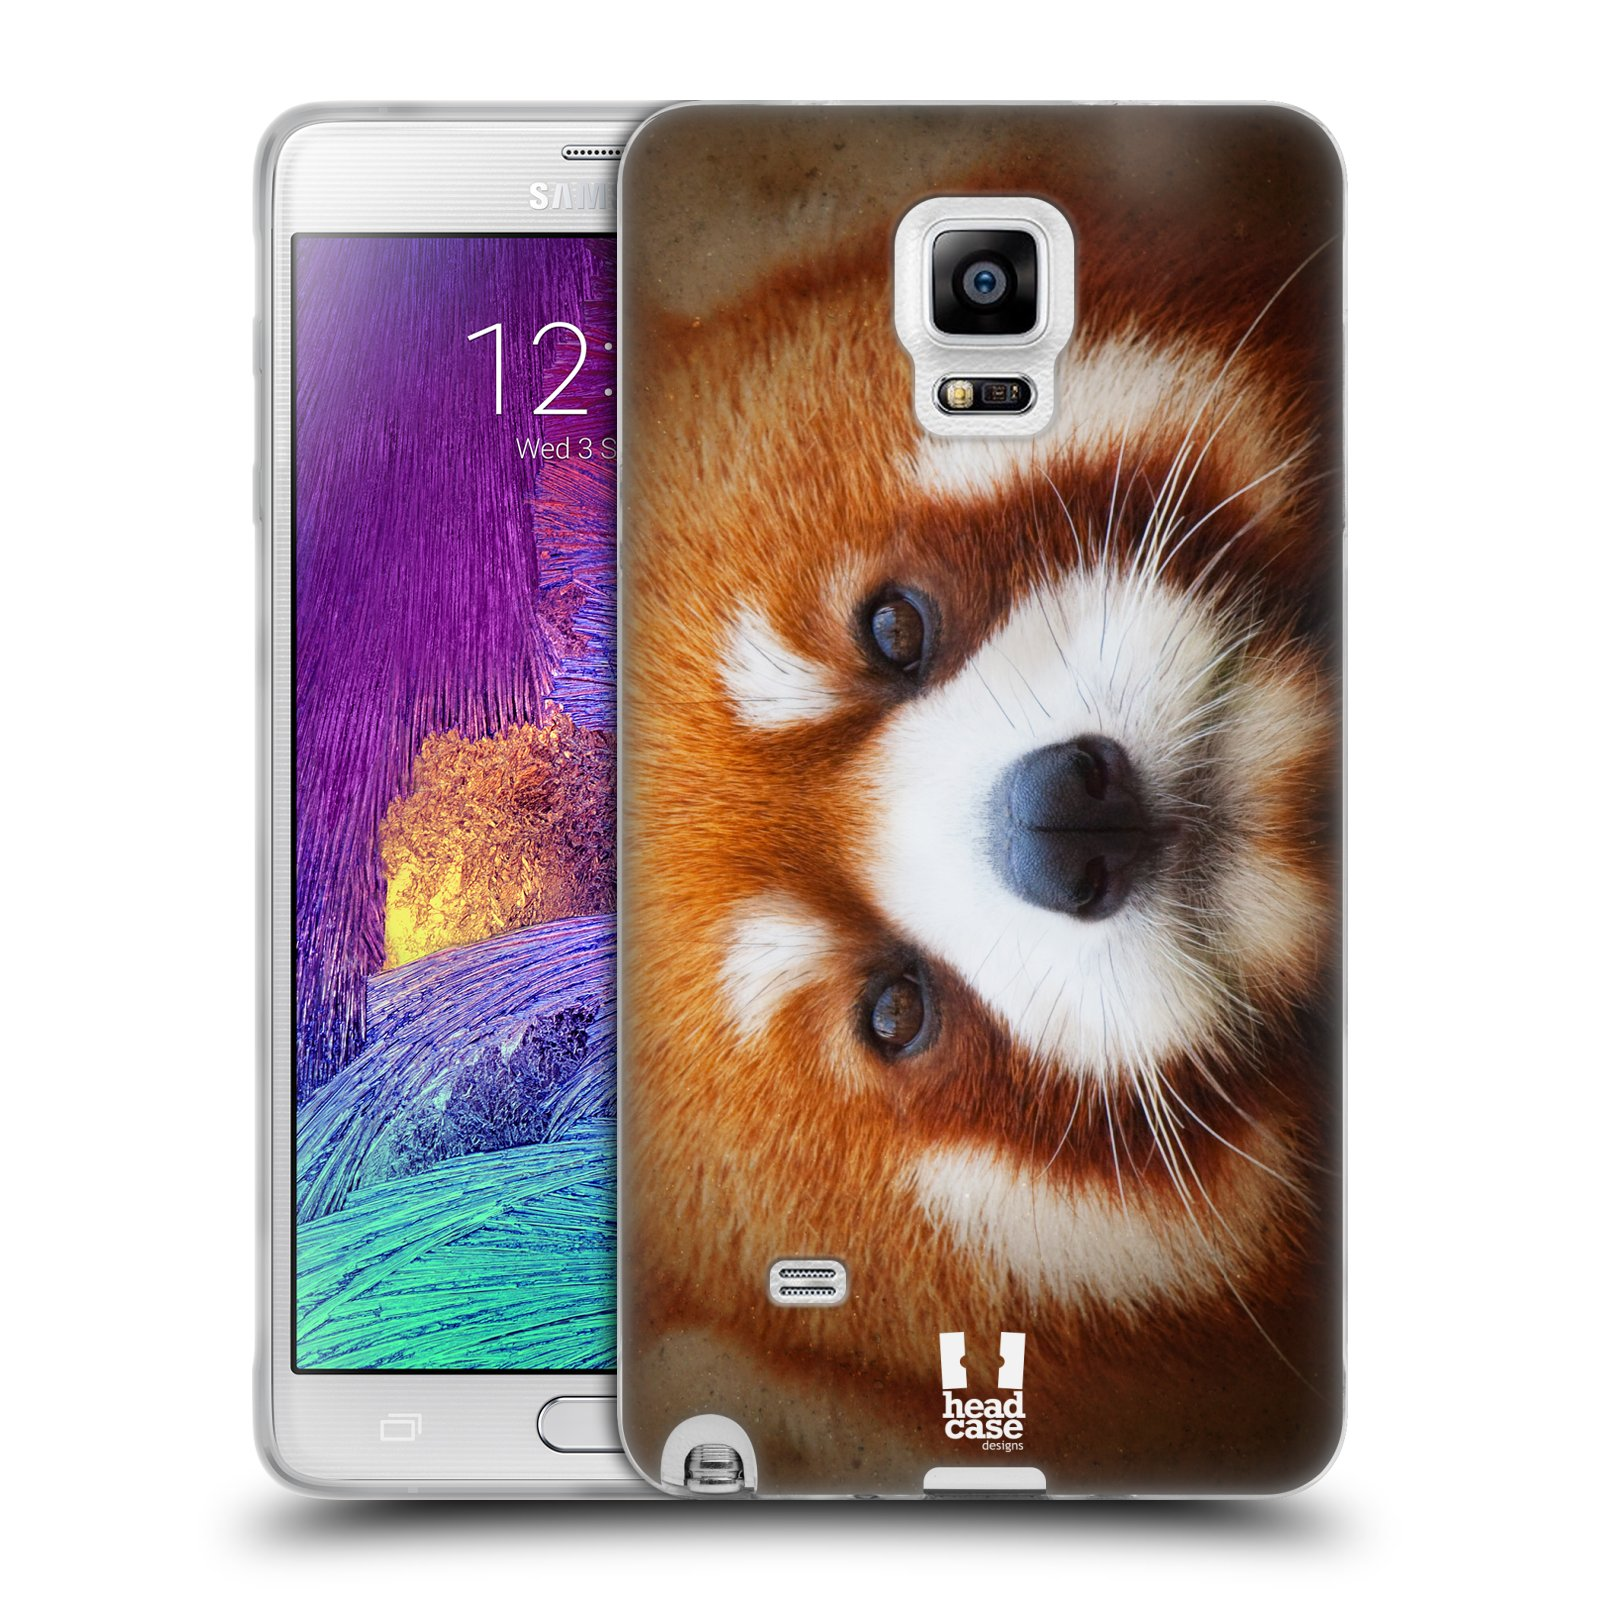 HEAD CASE silikonový obal na mobil Samsung Galaxy Note 4 (N910) vzor Zvířecí tváře 2 medvěd panda rudá